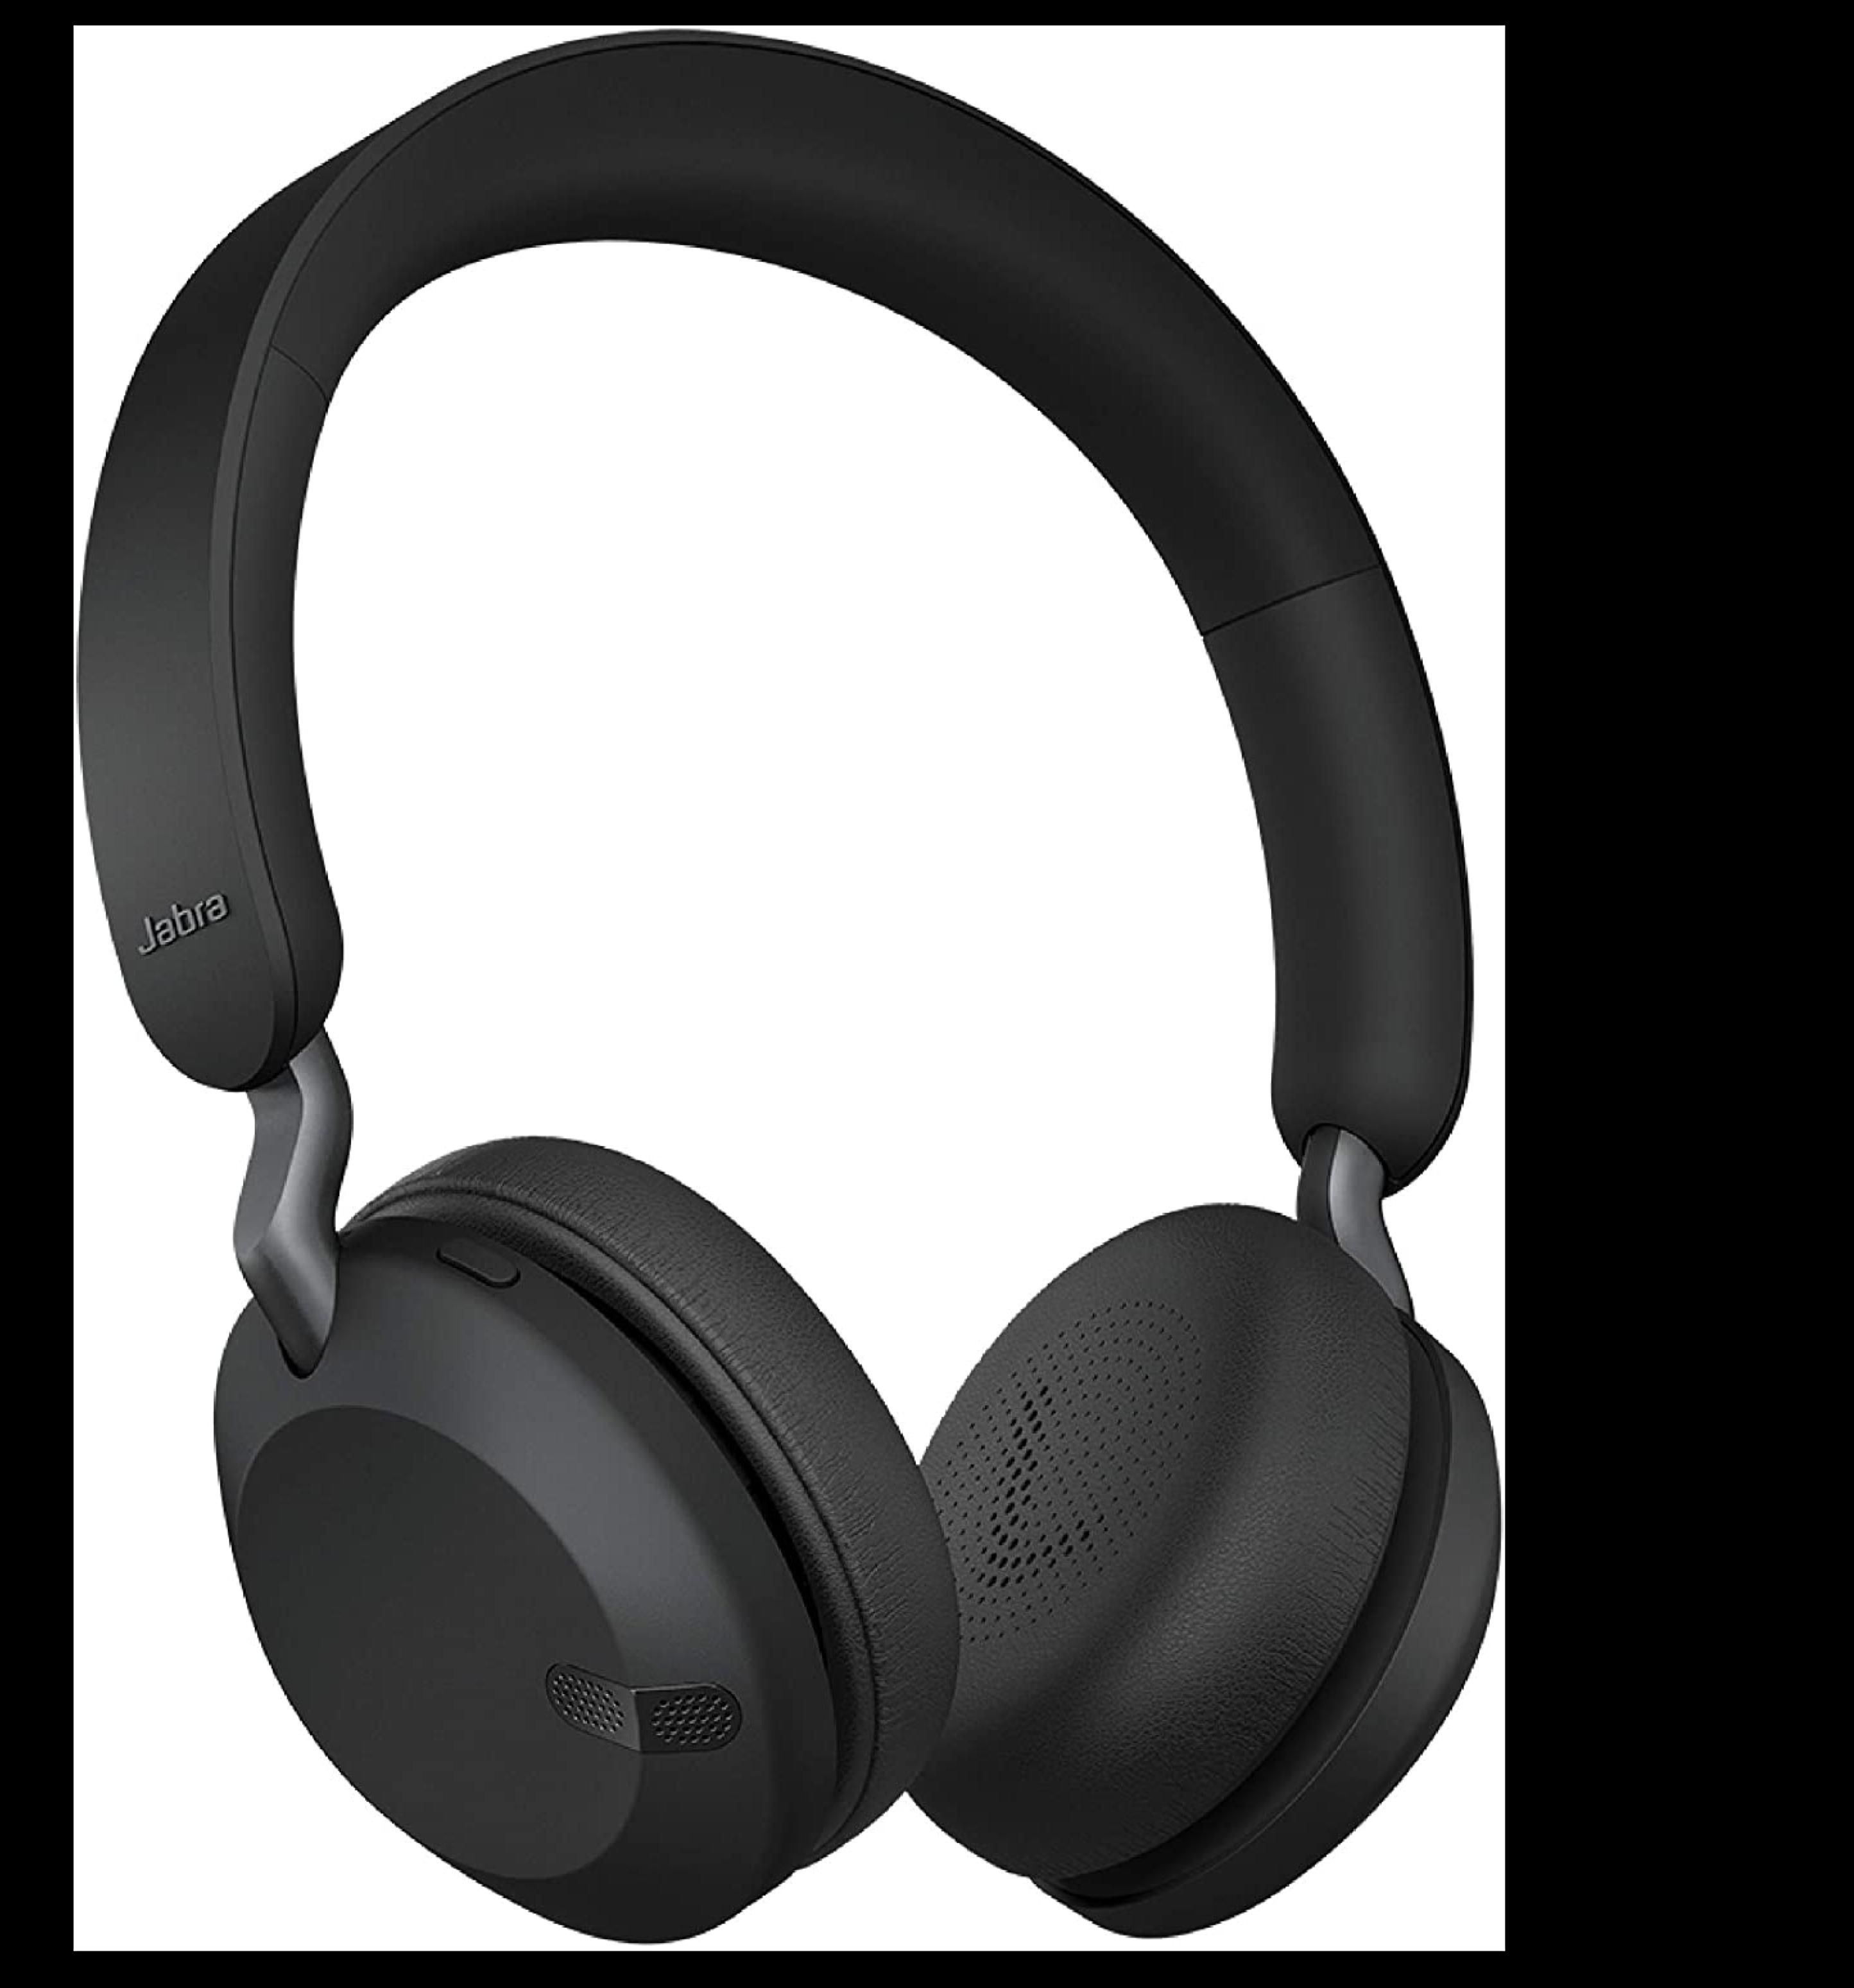 jabra 45h headset